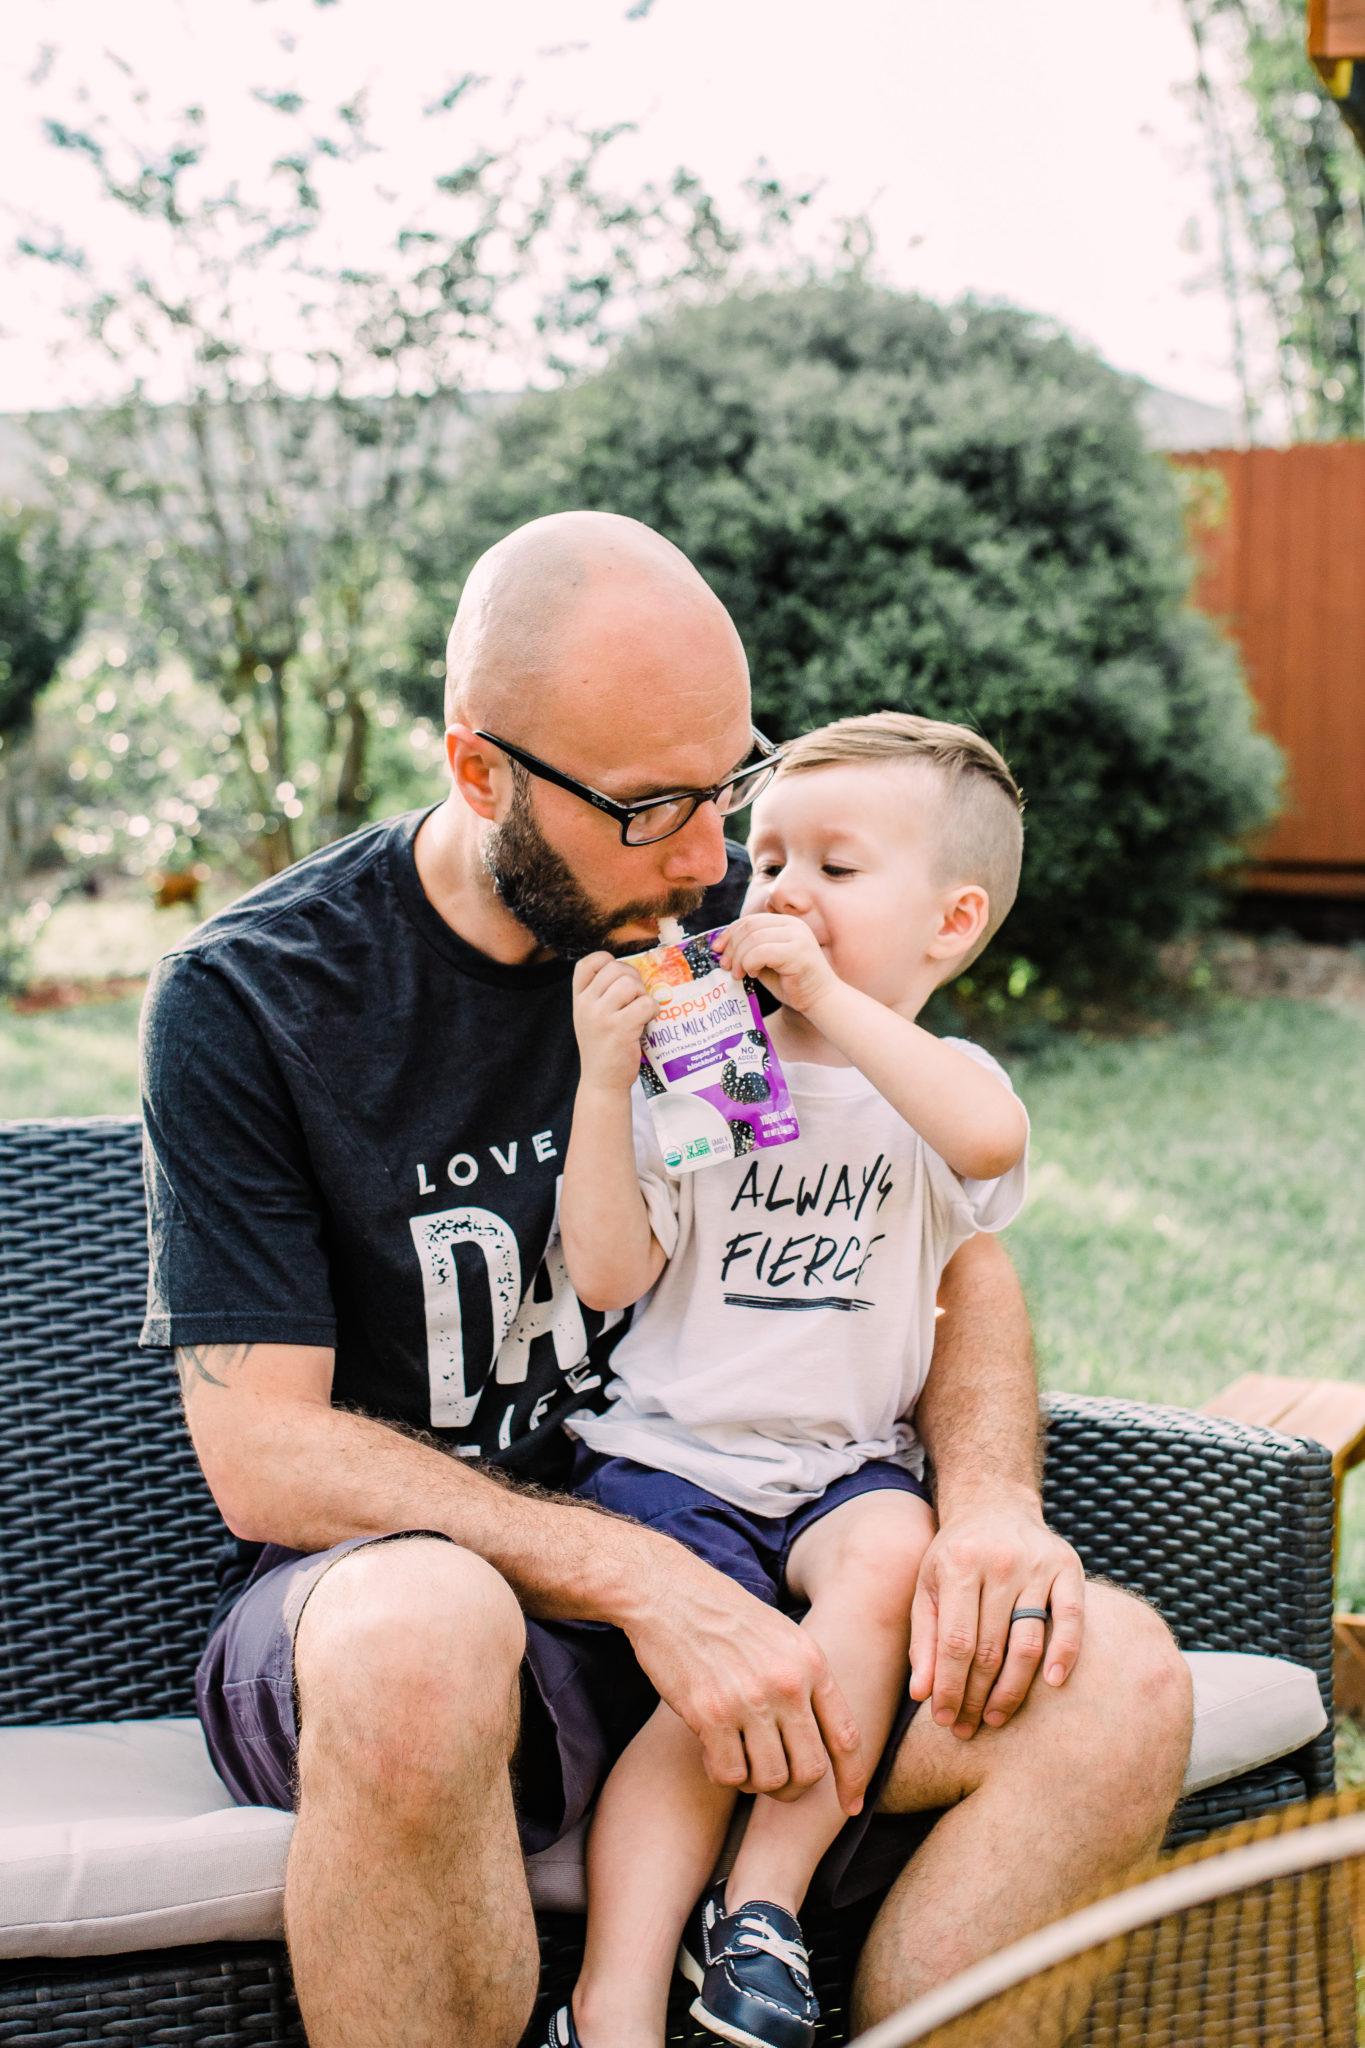 #ad #ThisIsHappy #TargetBaby, Refreshing Summer Treats for Toddlers, healthy snacks for toddlers, organic yogurt pouches, fun ways to enjoy yogurt treats